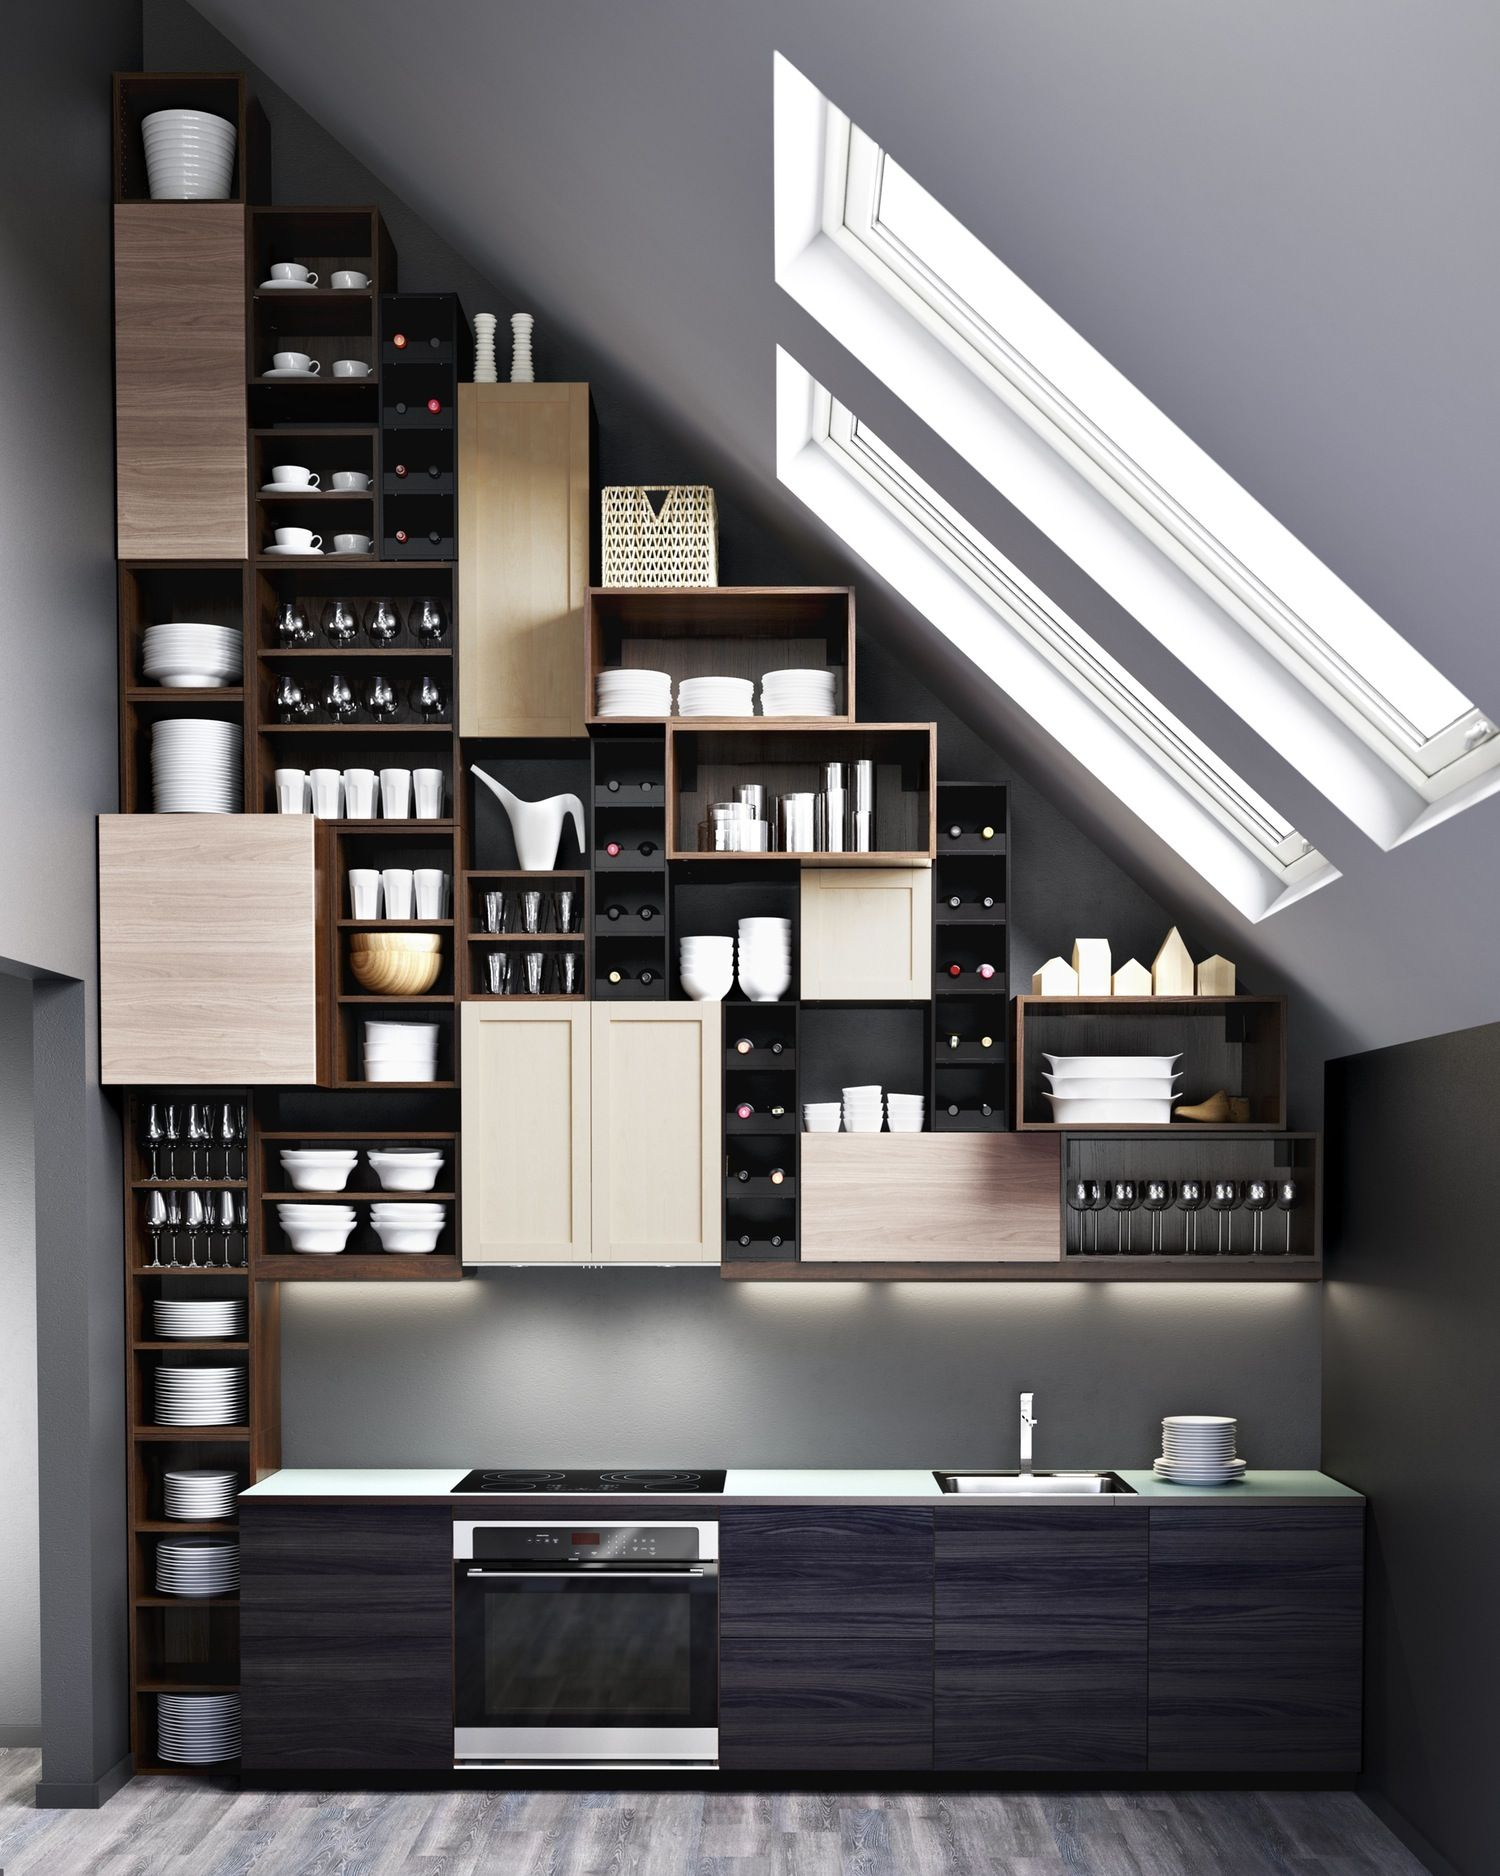 Ikea Kitchen Cabinets Price List